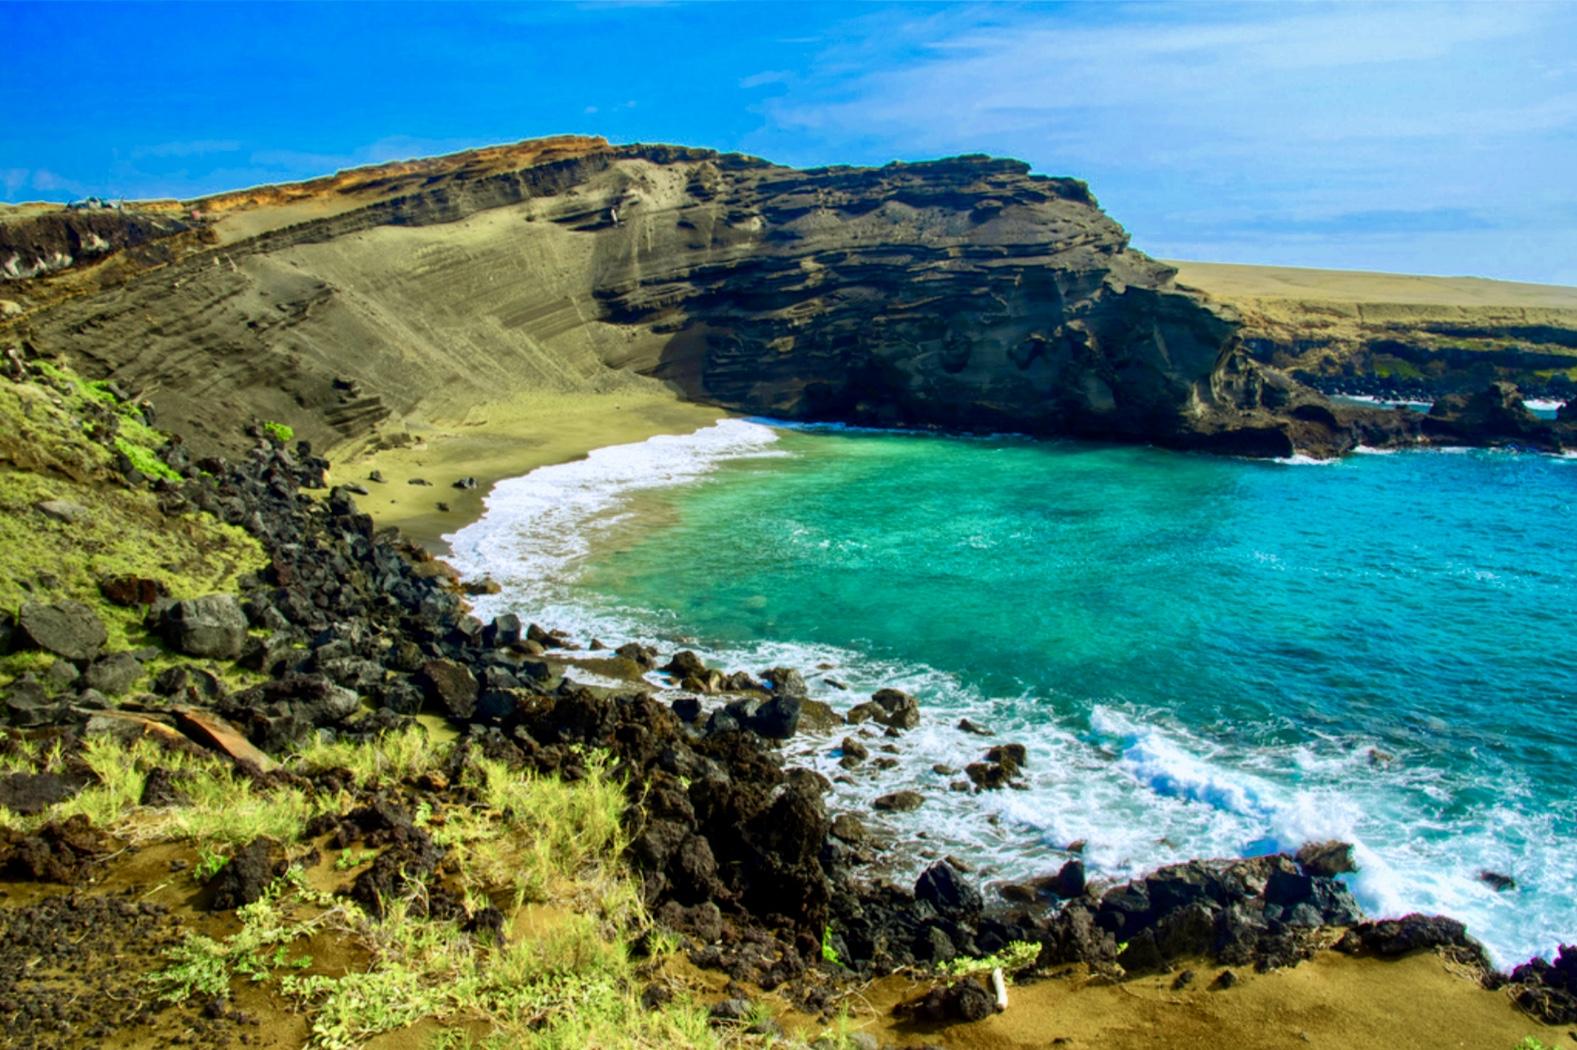 Beautiful Papakolea Green Sand Beach just a short hike away!